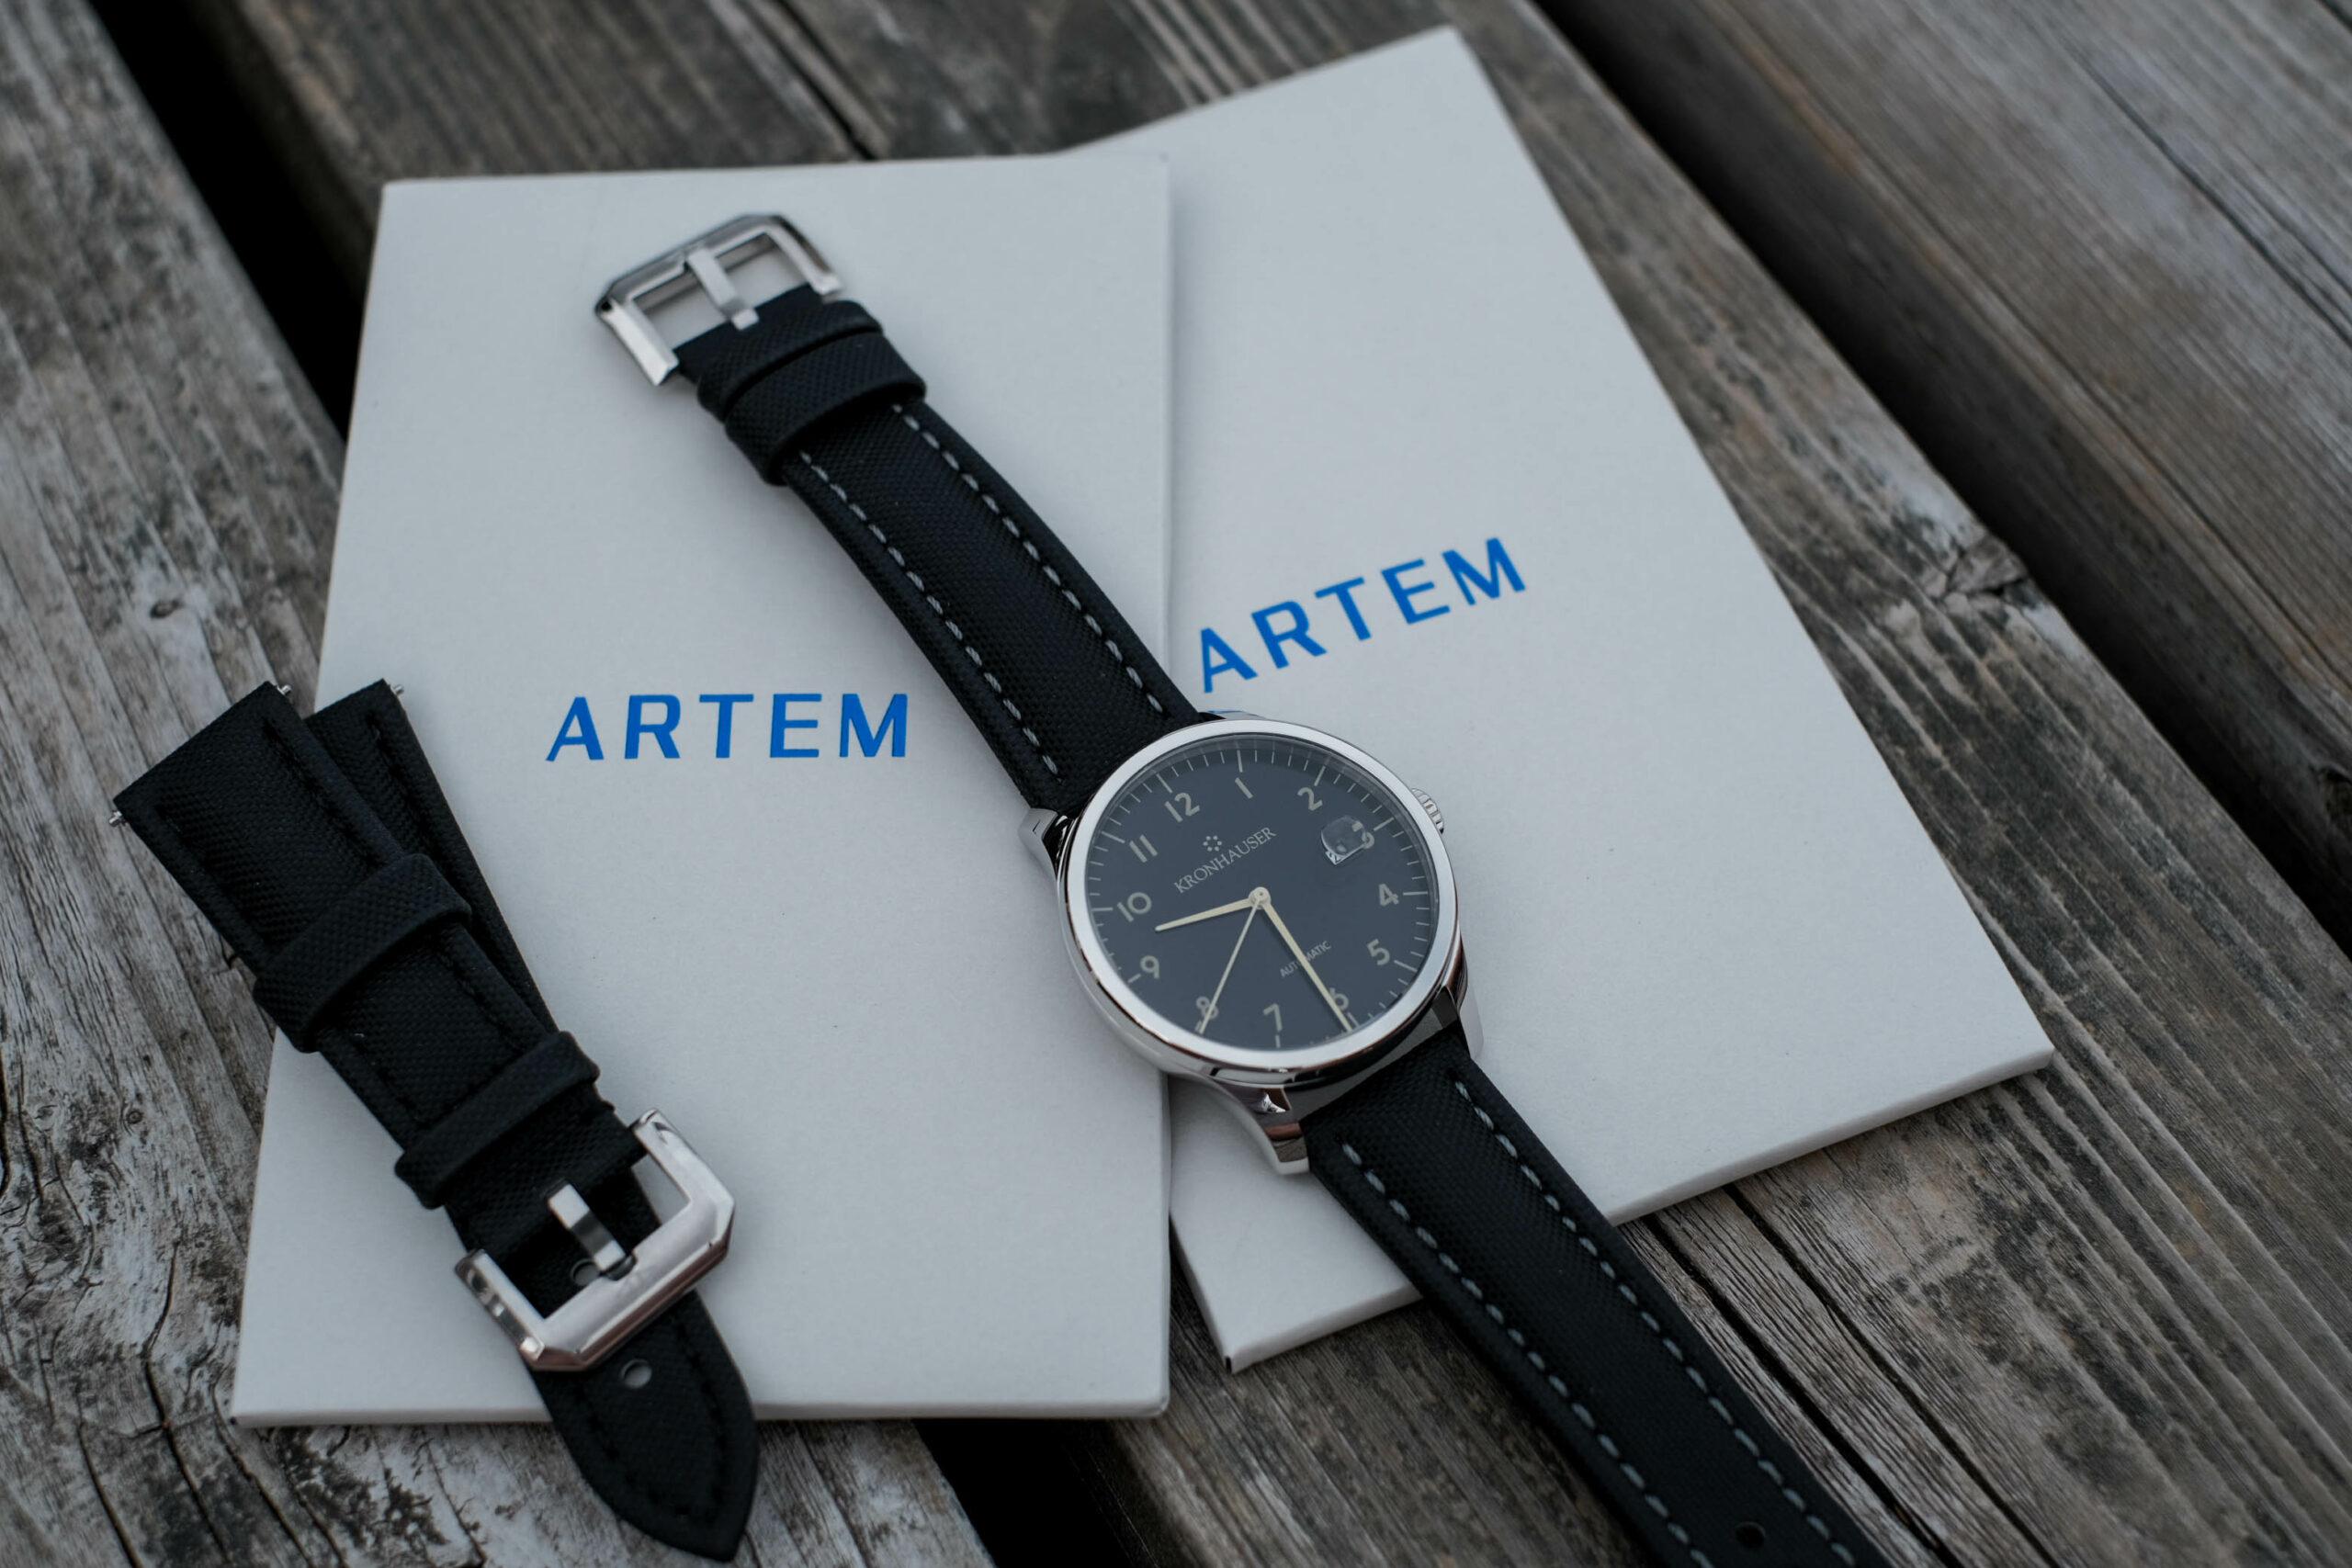 Artem Sailcloth Watch Straps Review